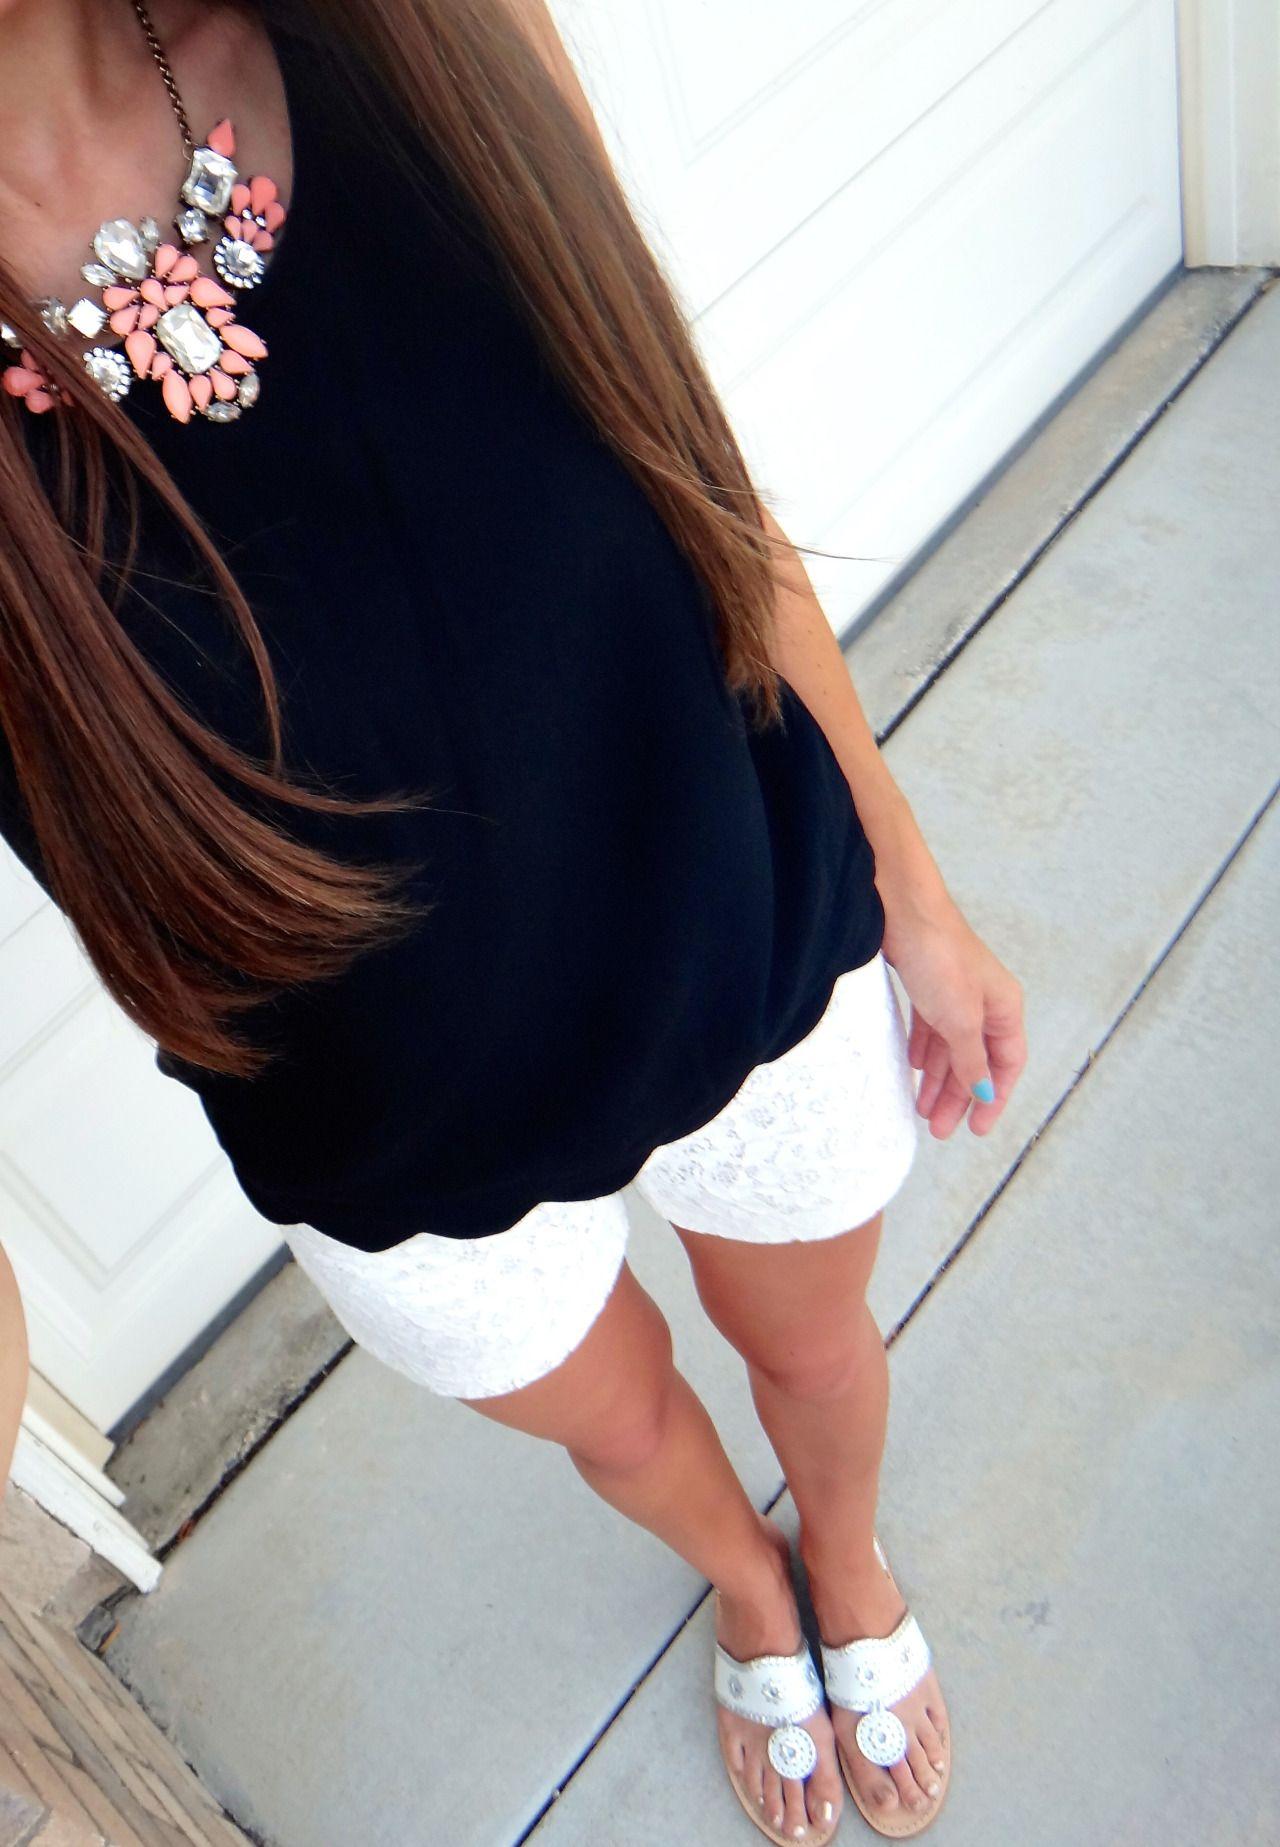 Please Follow Teenage Beauty For Fashion Fandoms and Fun  Clothes